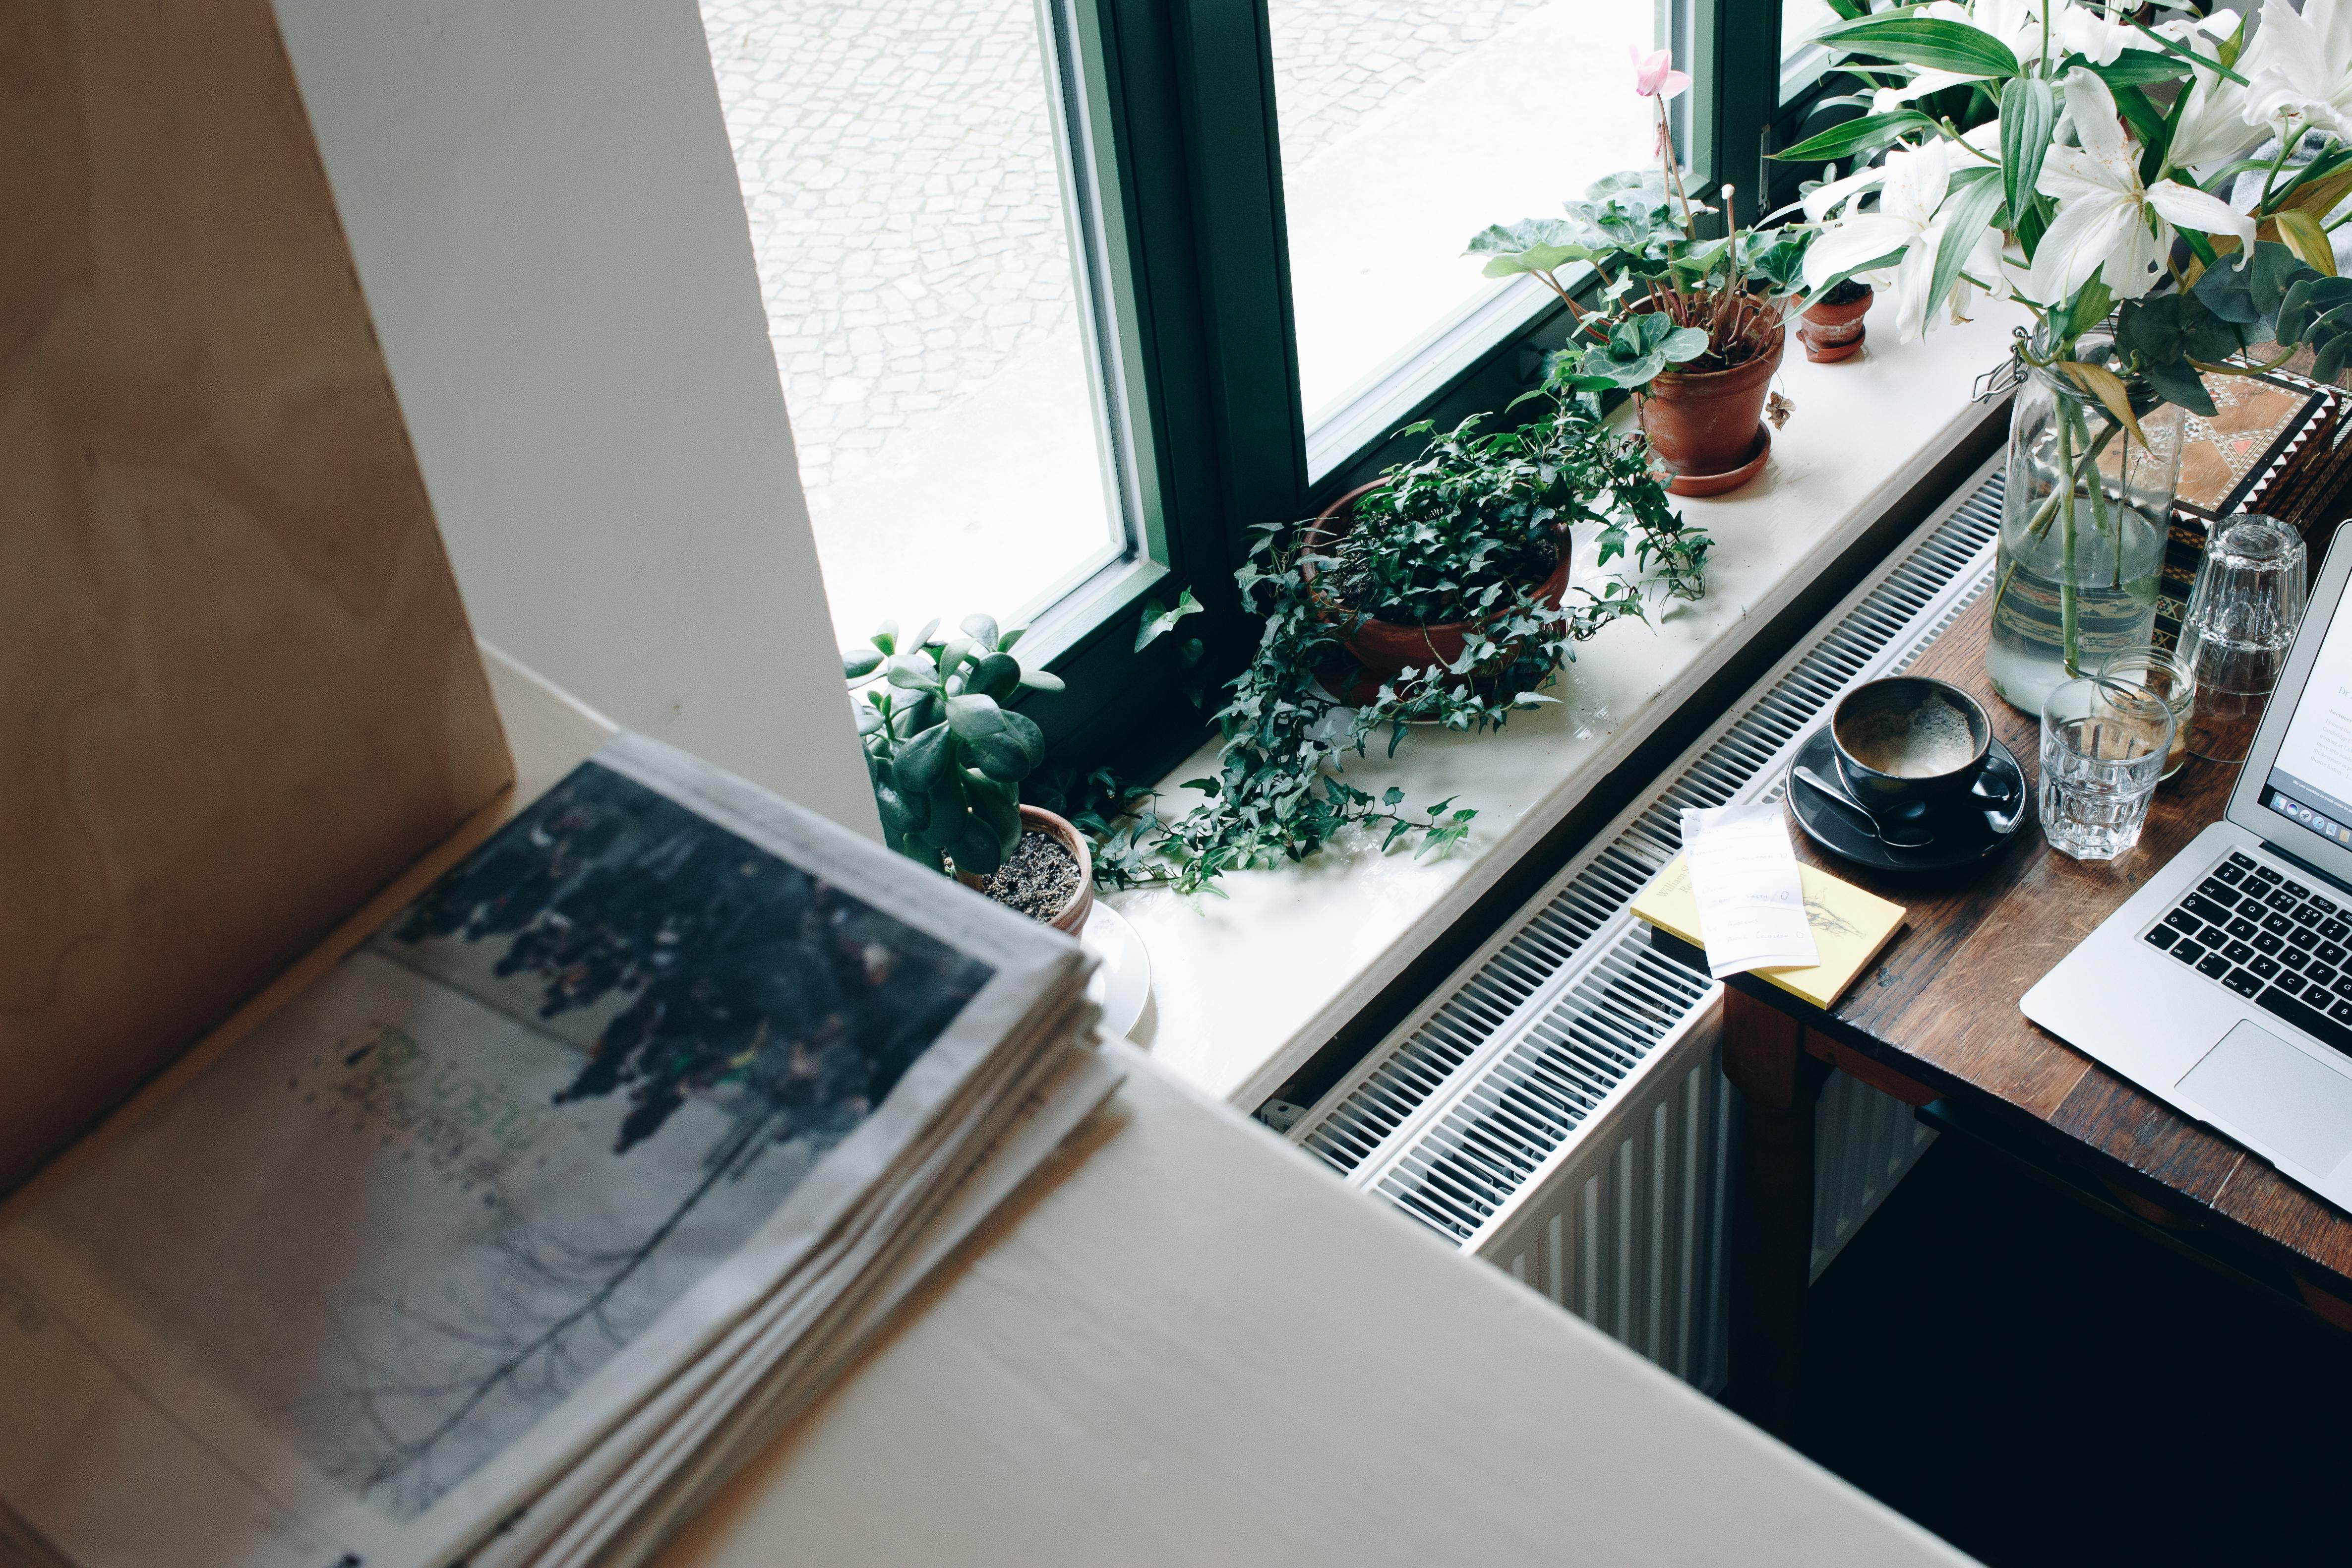 s1 vinyl&kaffee-leutzsch-leipzig-annabelle sagt15